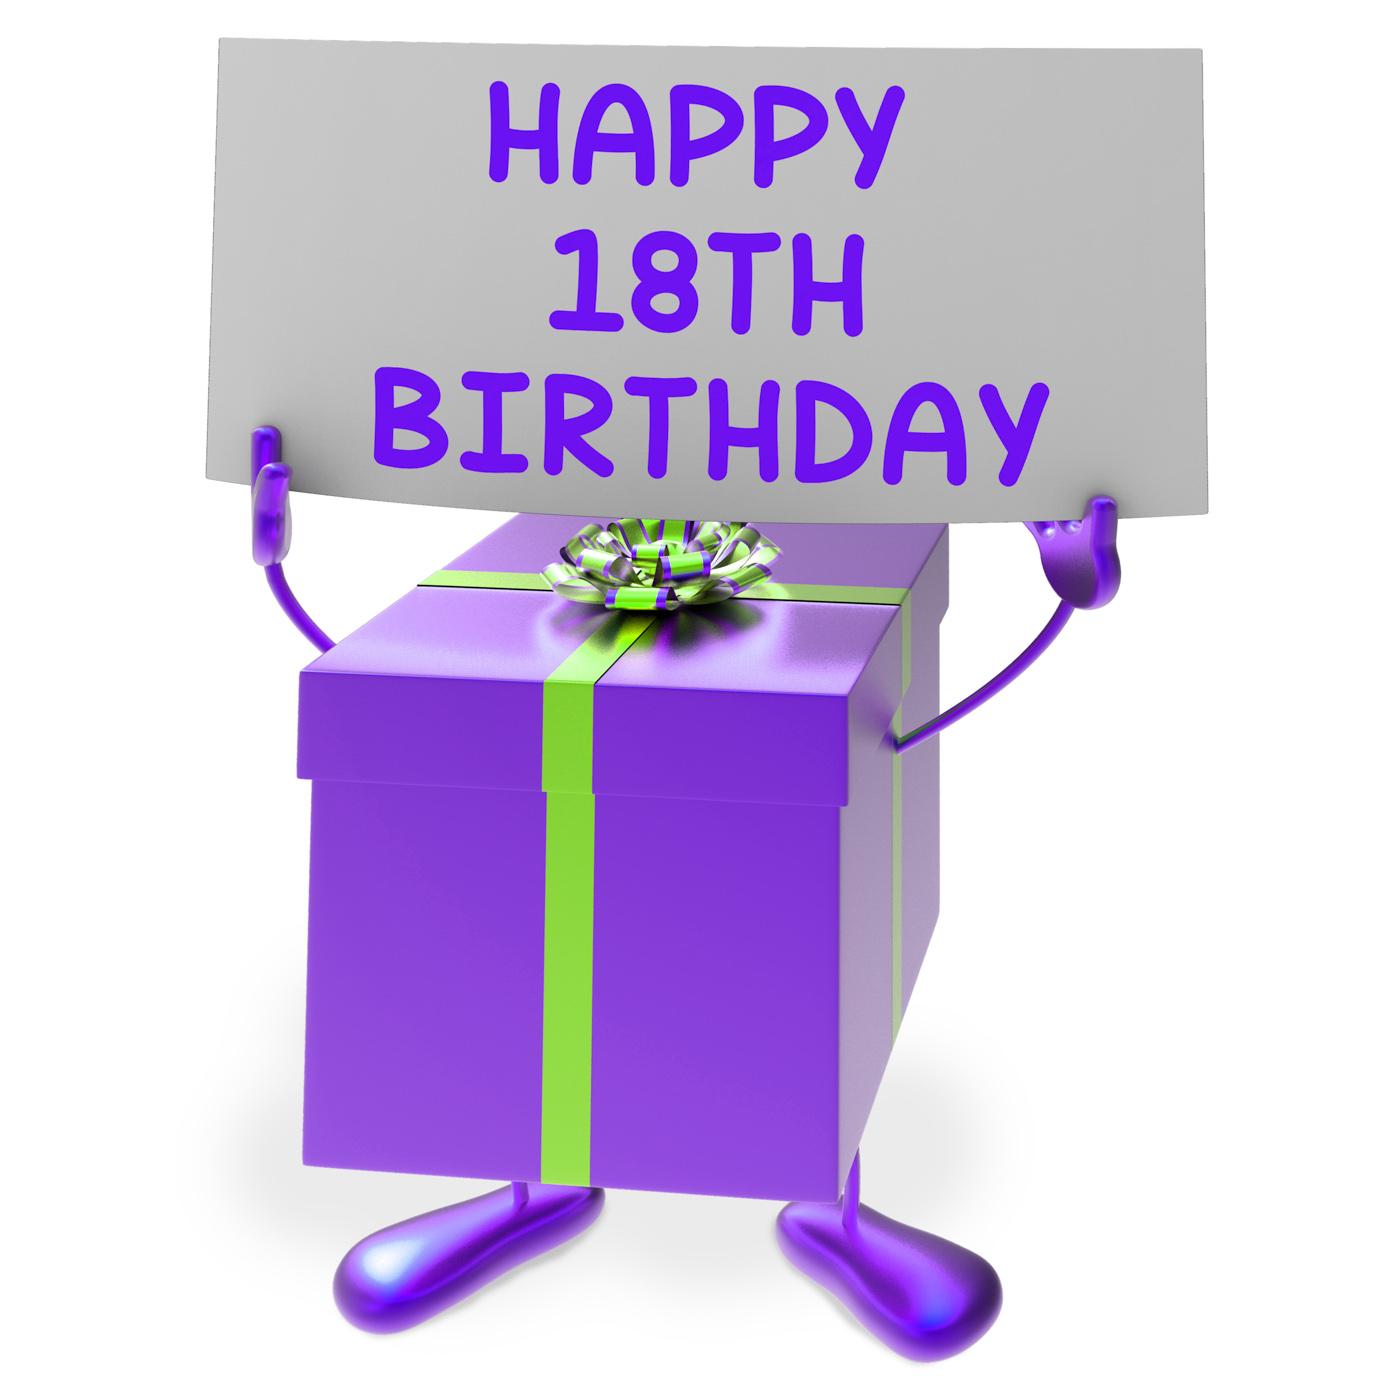 Happy 18th Birthday To Me Happy18thBirthday Com